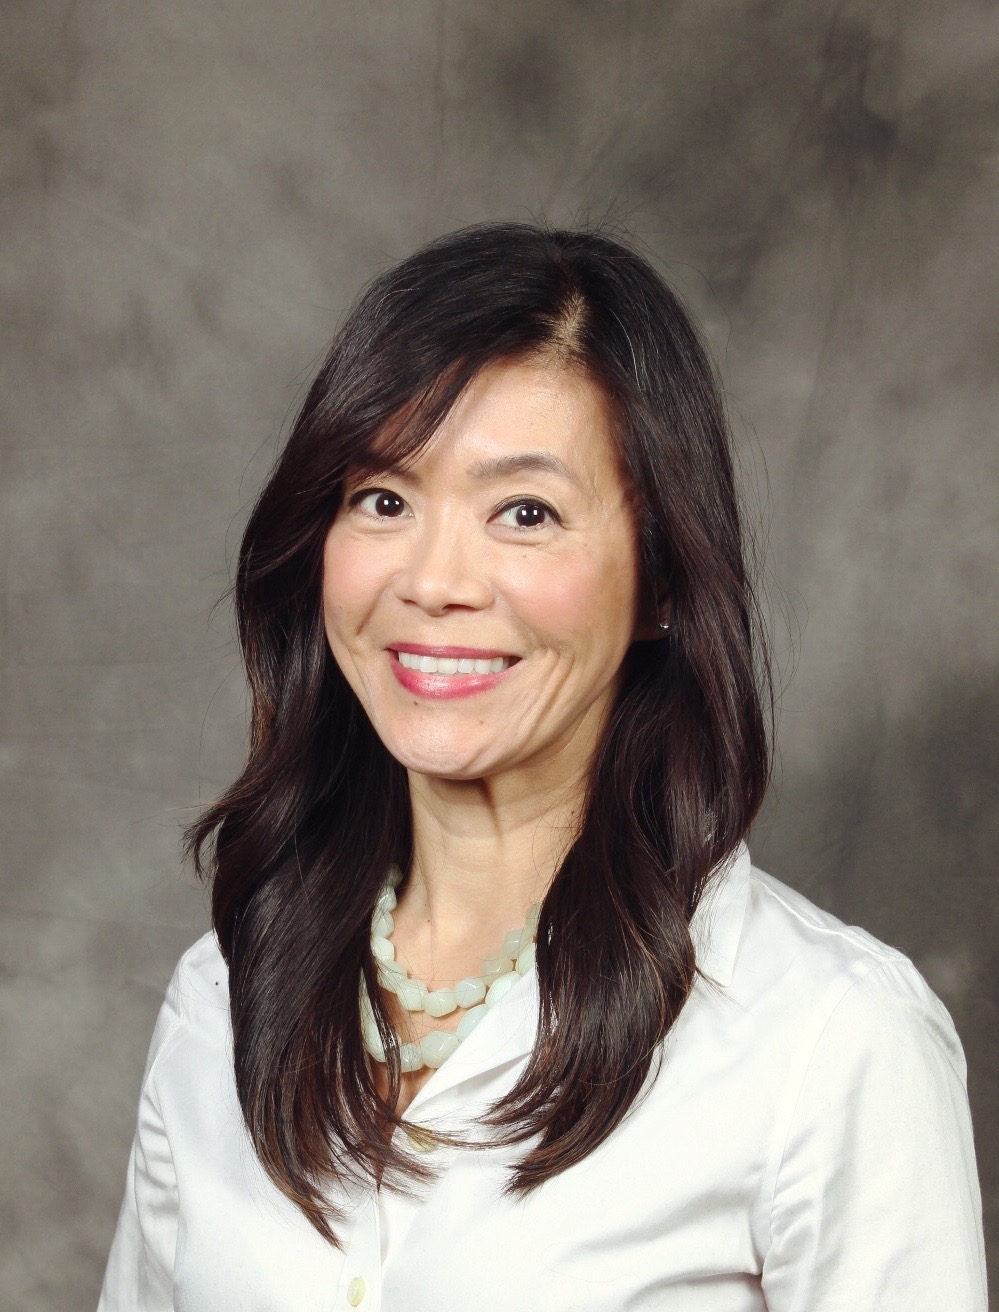 Melissa Louie, MPA, LCSW, C-ASWCM